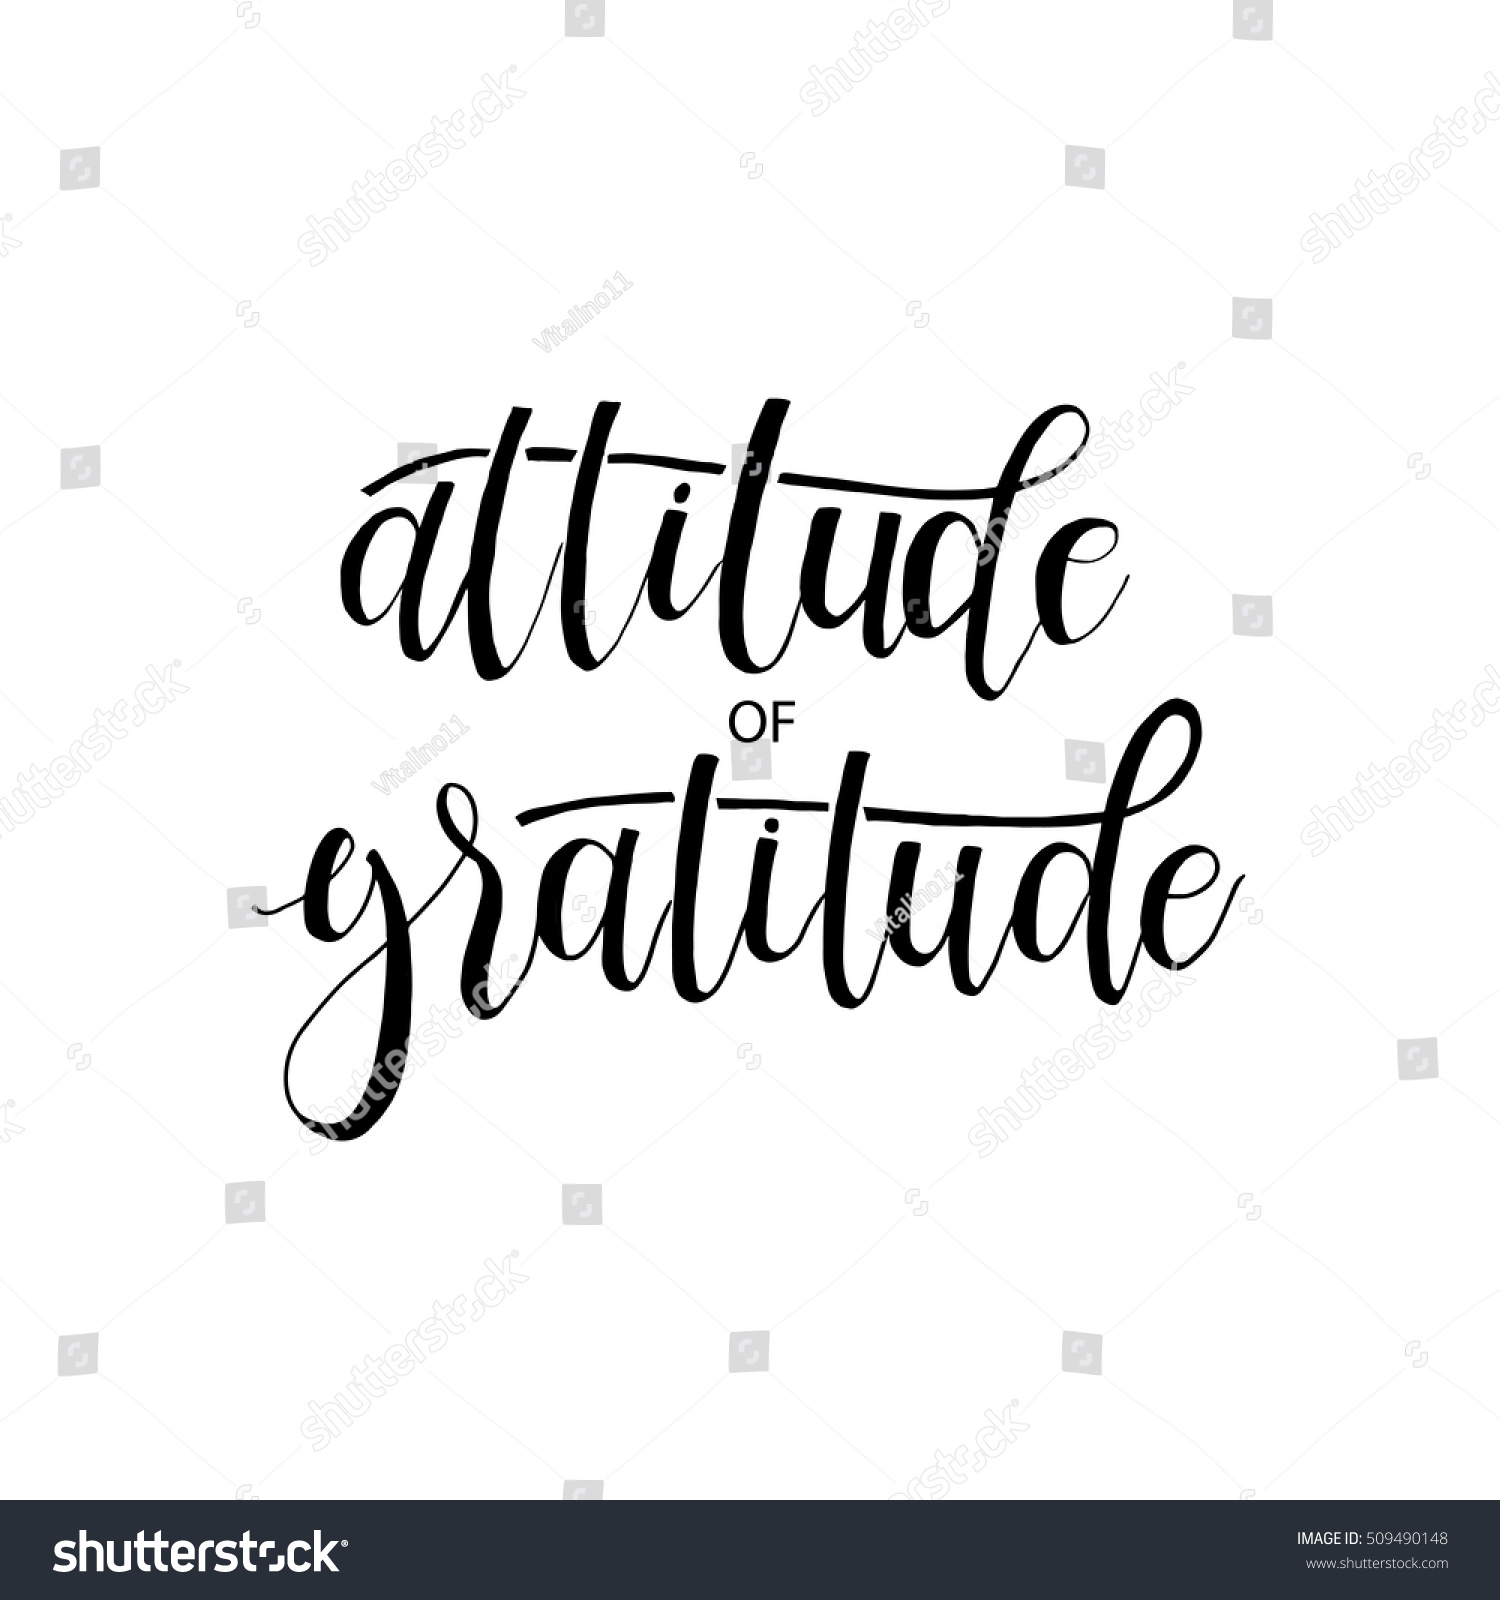 Attitude Of Gratitude Card Hand Drawn Lettering Ink